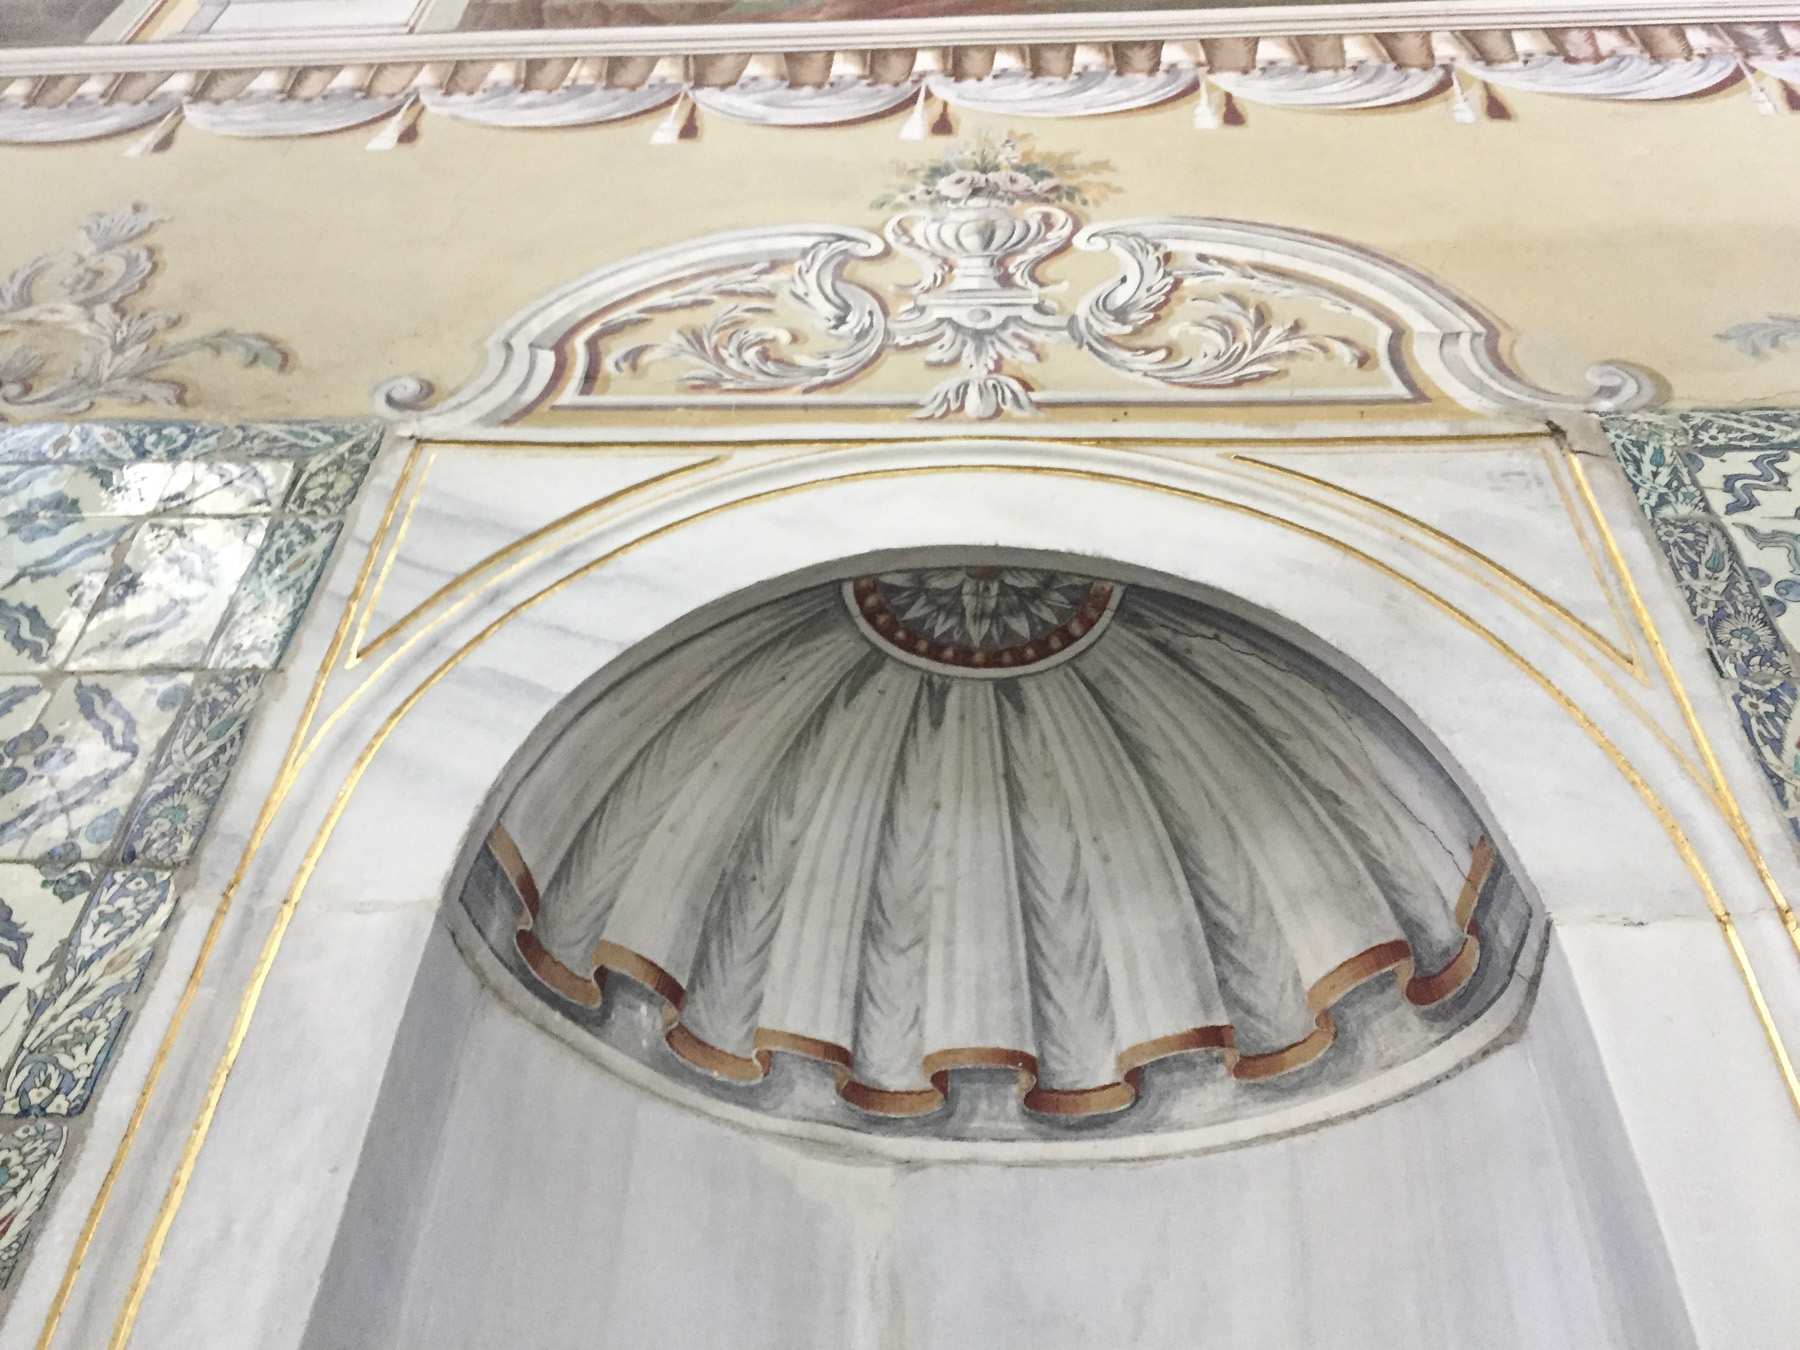 try wonder inspo istanbul turkey topkapi palace